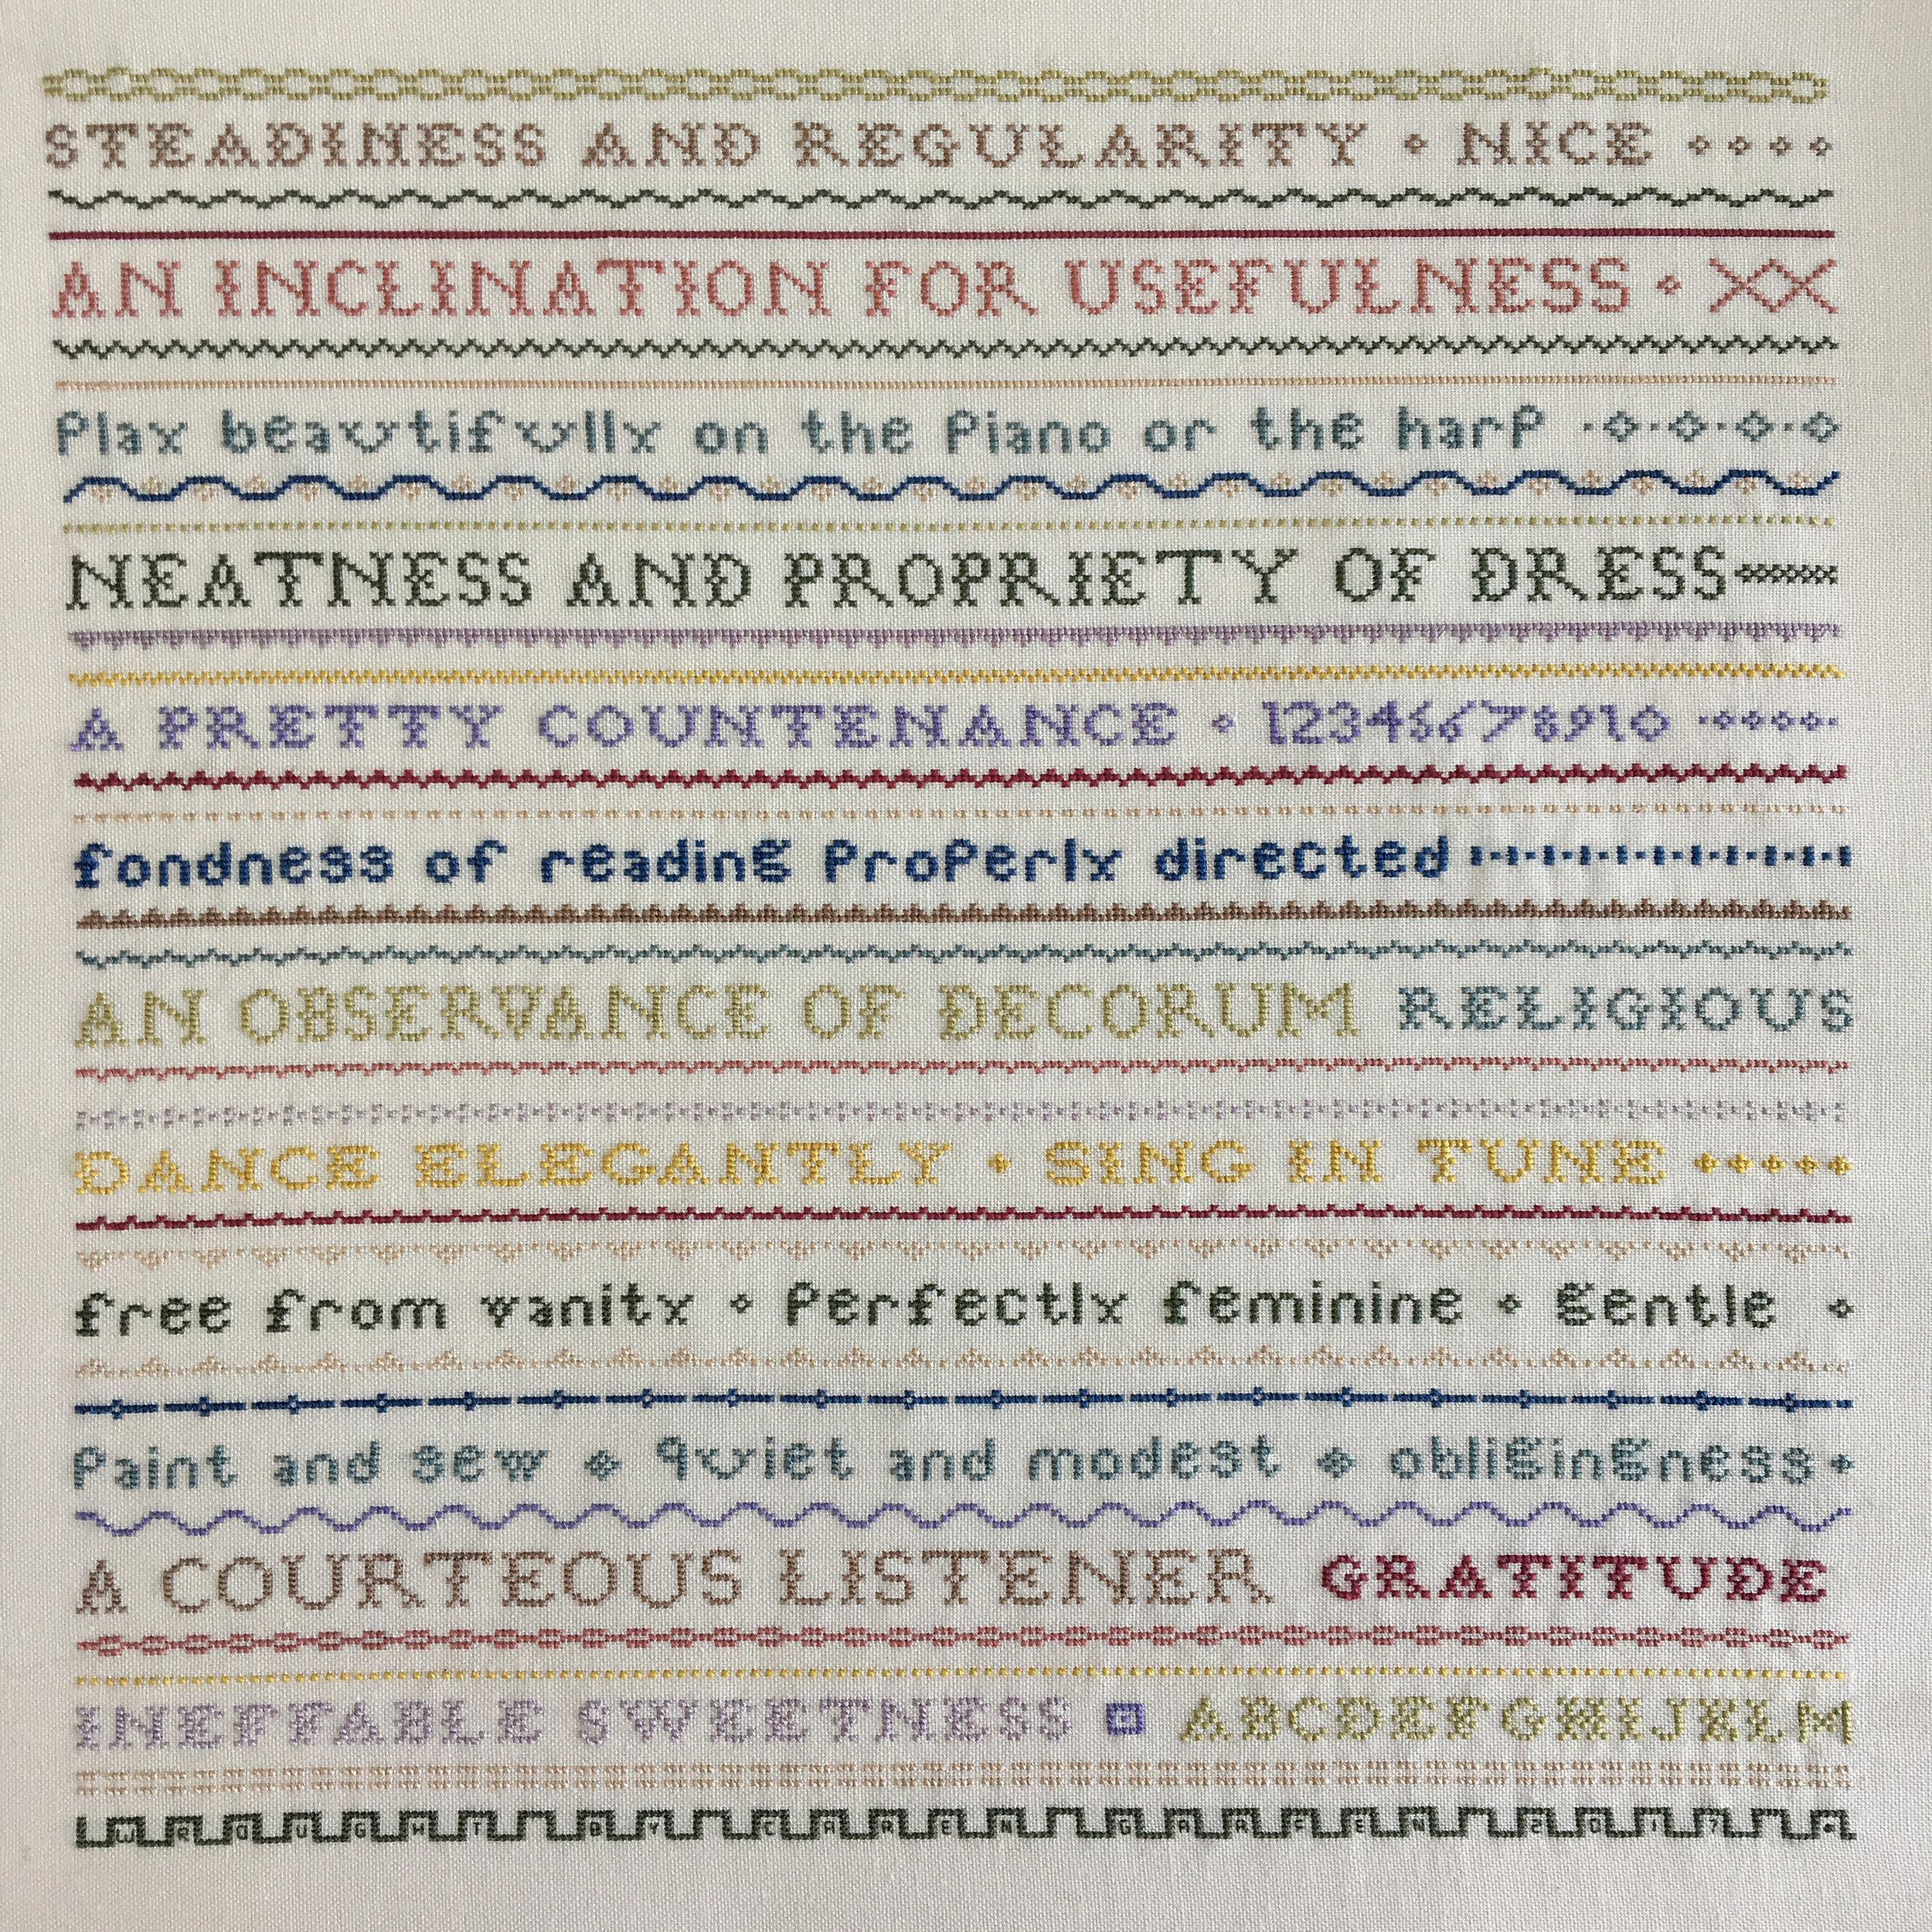 Jane Austen Community Quilt Project, Caren Garfen, Image 1.jpg